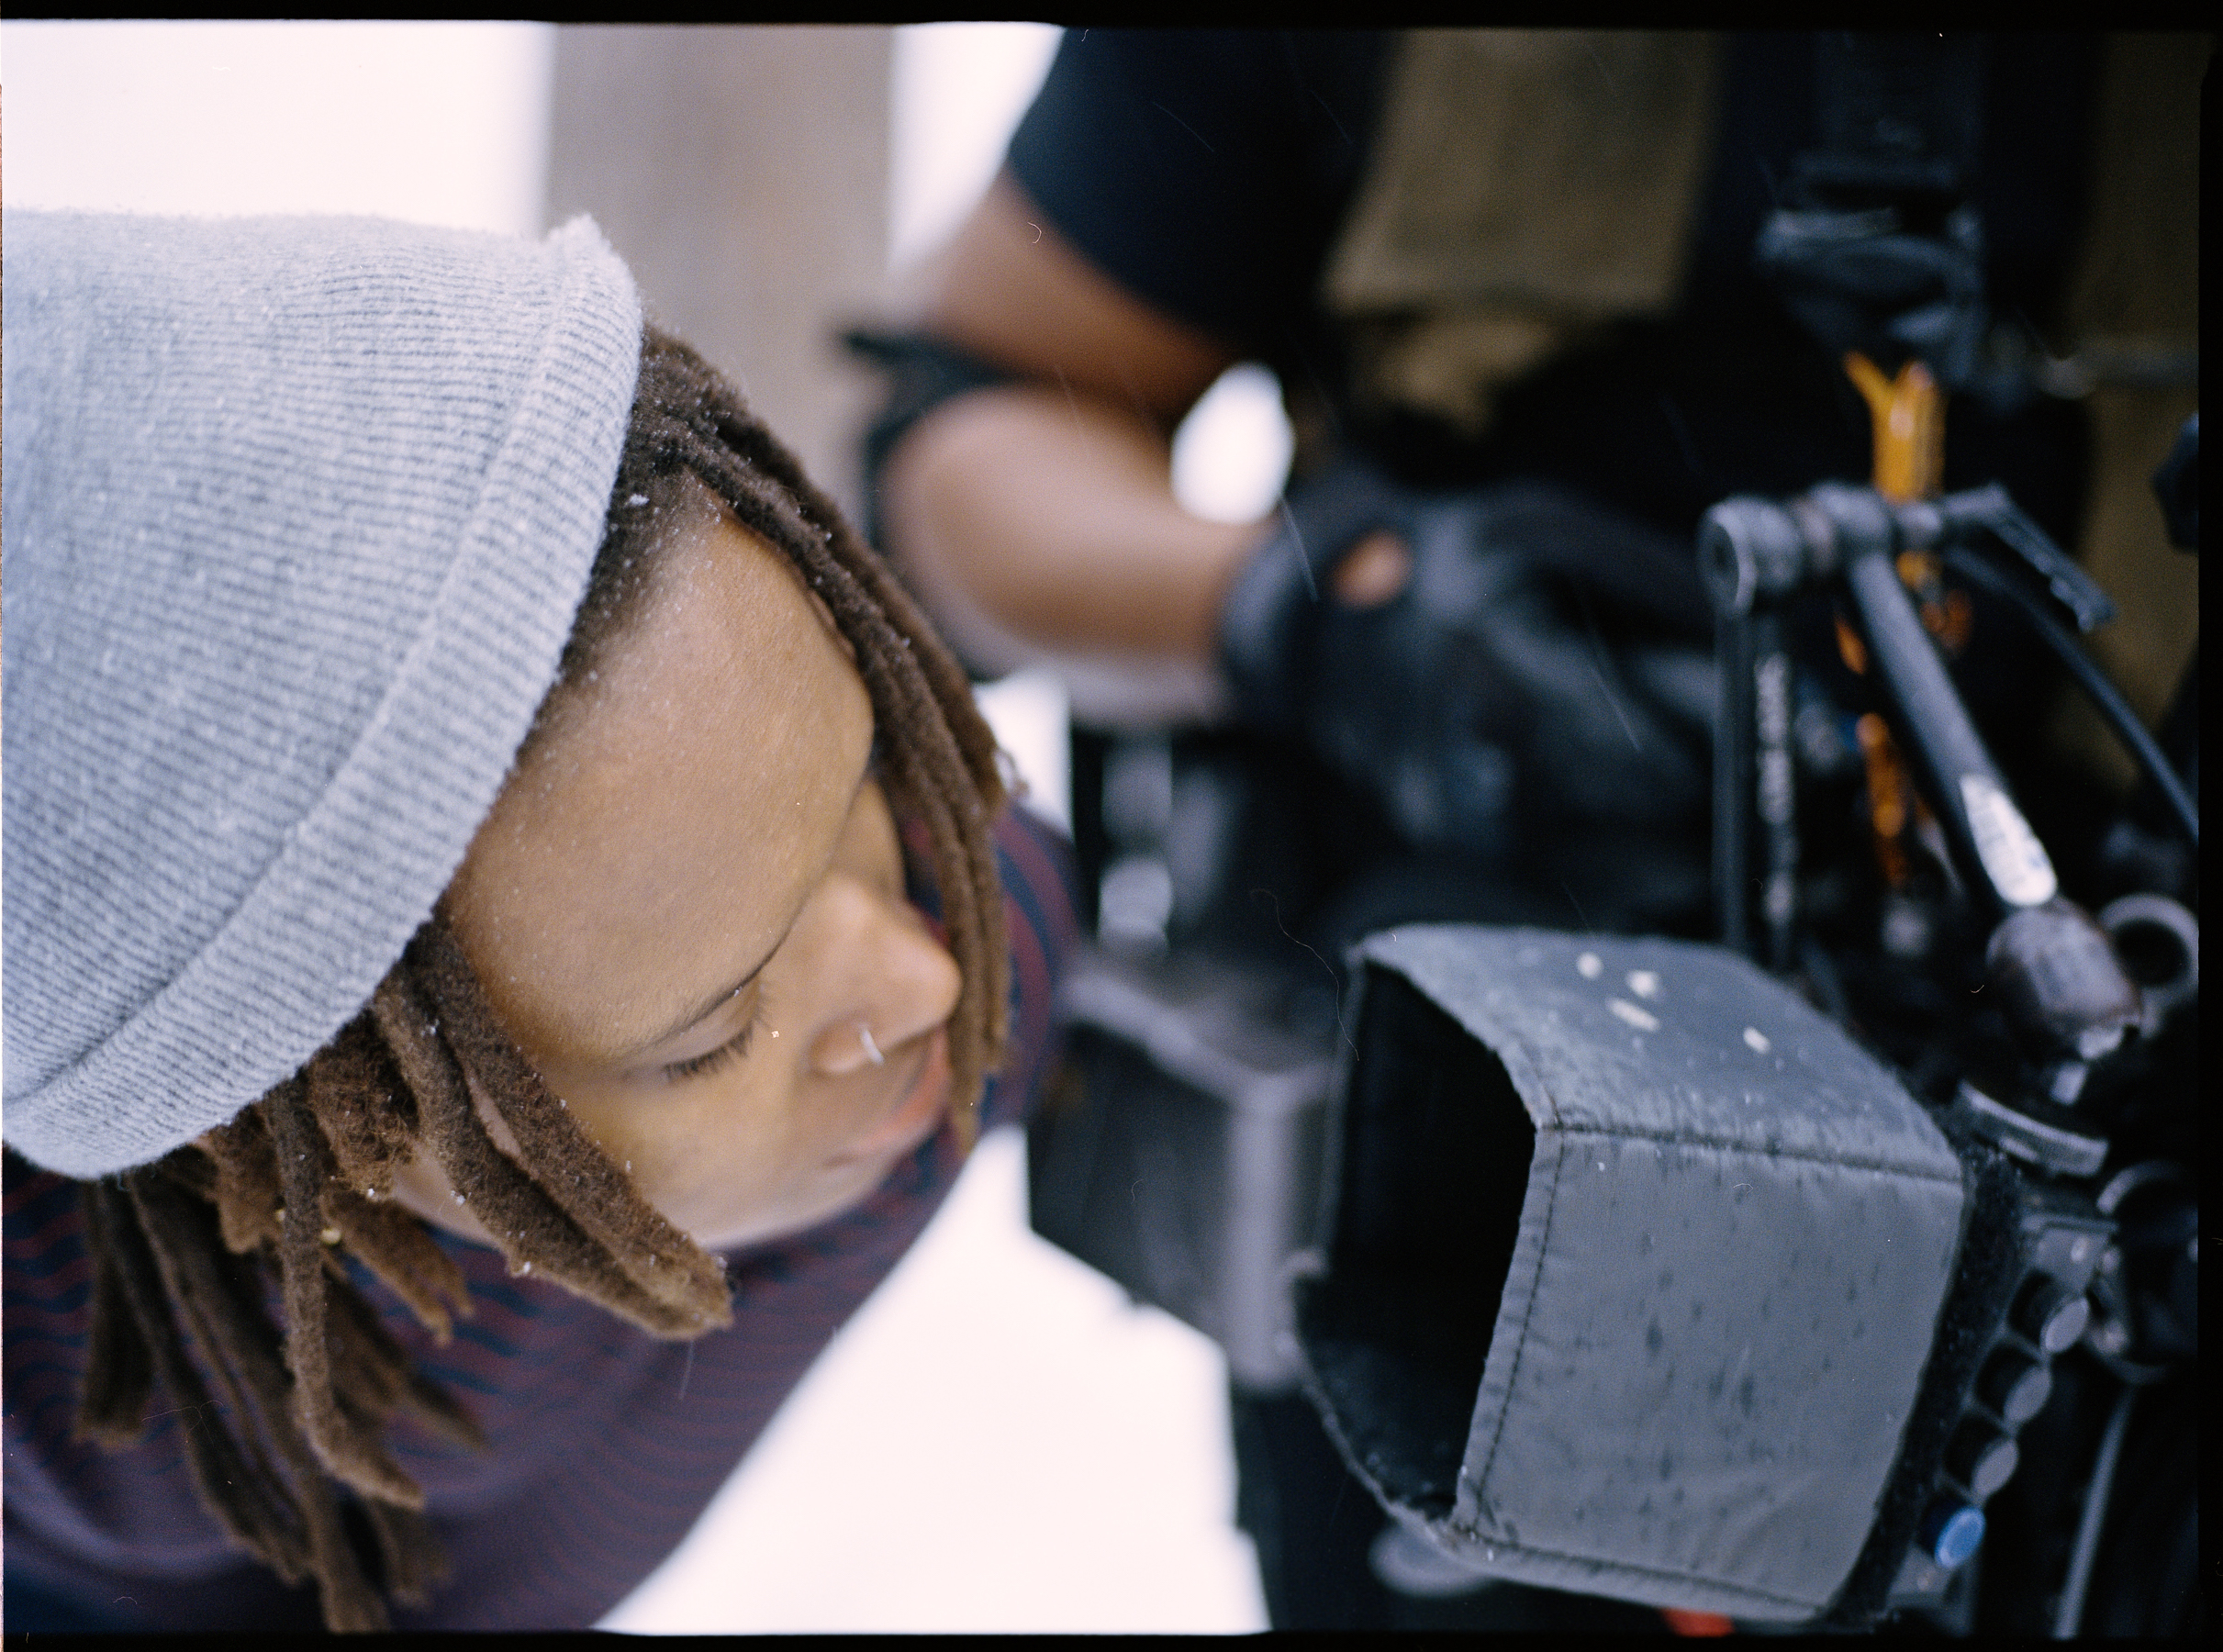 Writer/director Raven Jackson on monitor  645 Kodak Portra (Medium Format)